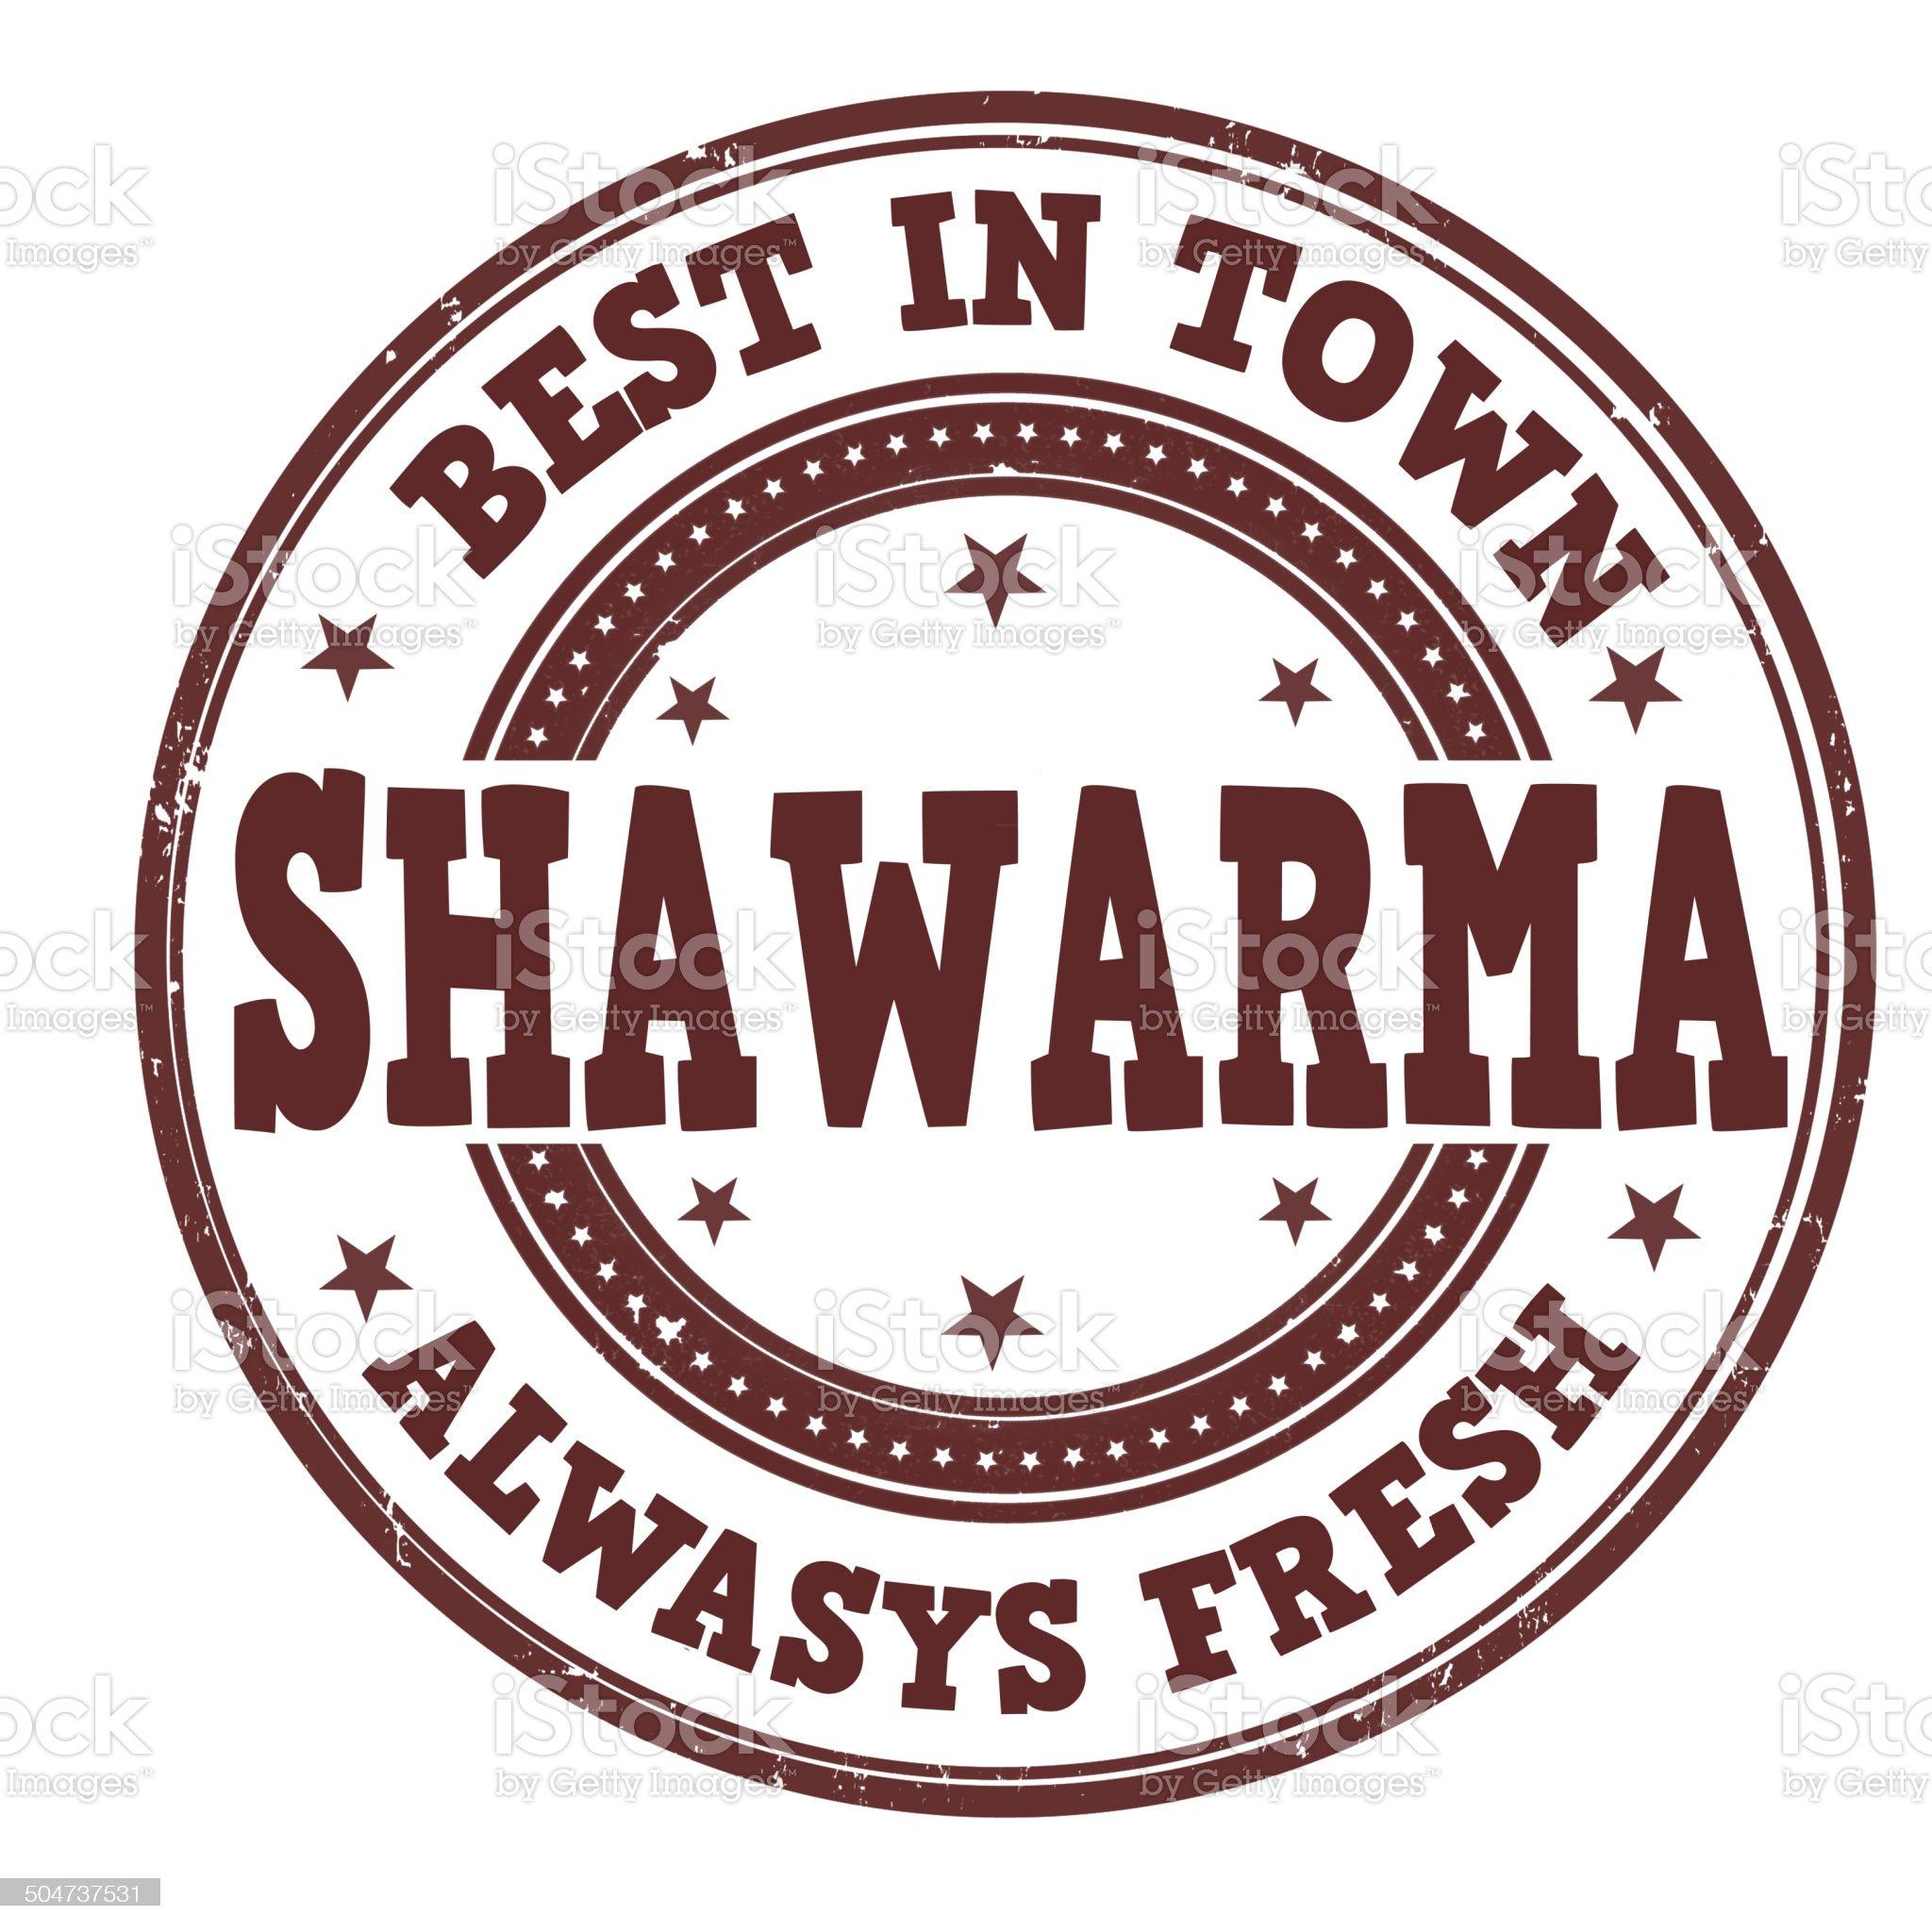 Shawarma stamp royalty-free stock vector art